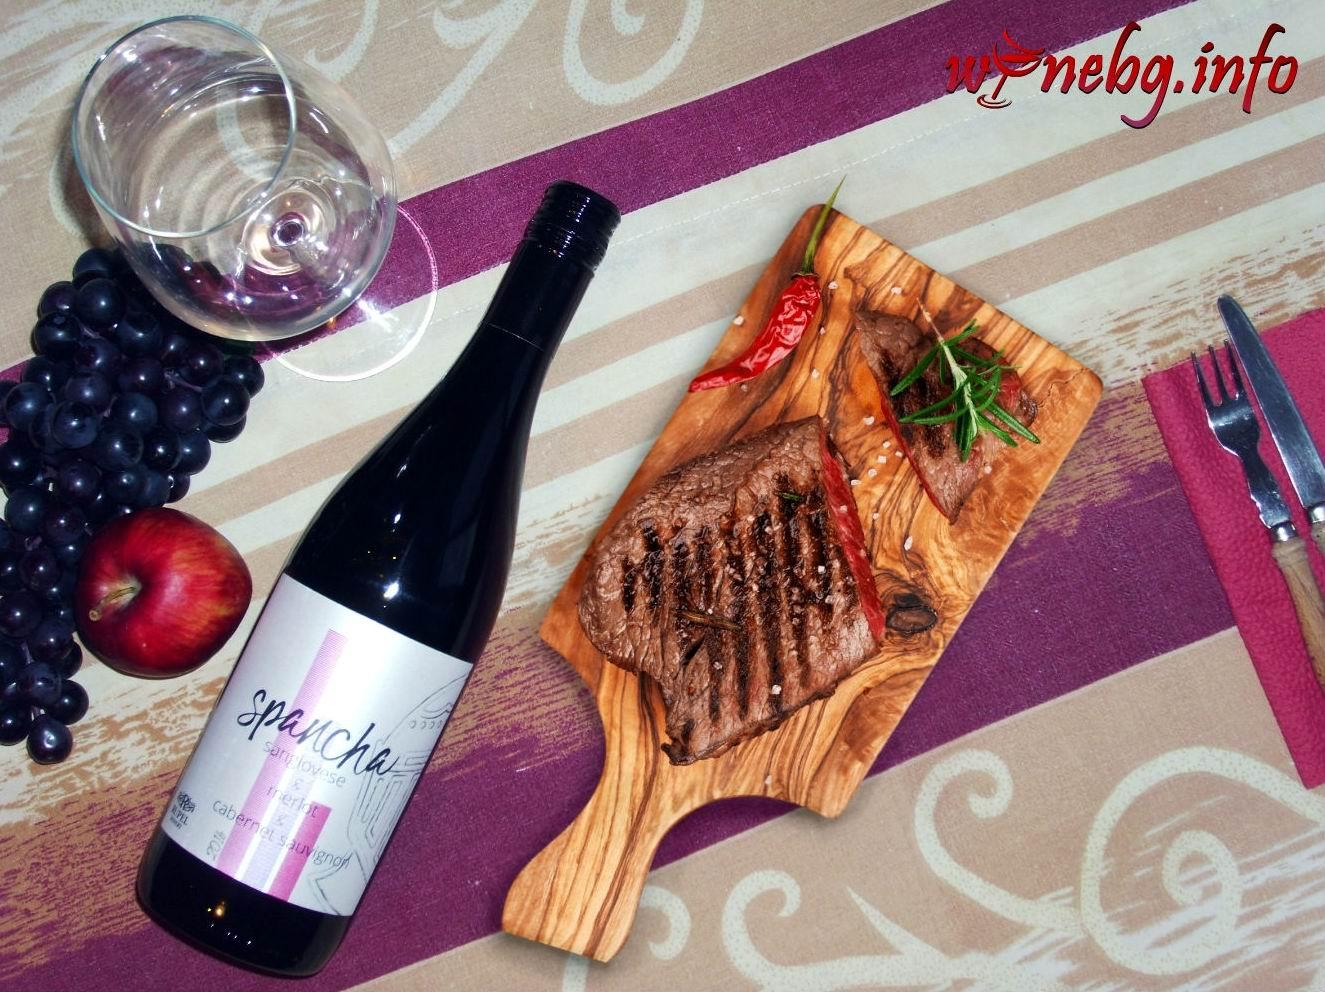 Spancha Sangiovese & Merlot & Cabernet Sauvignion 2016 – Rupel Winery